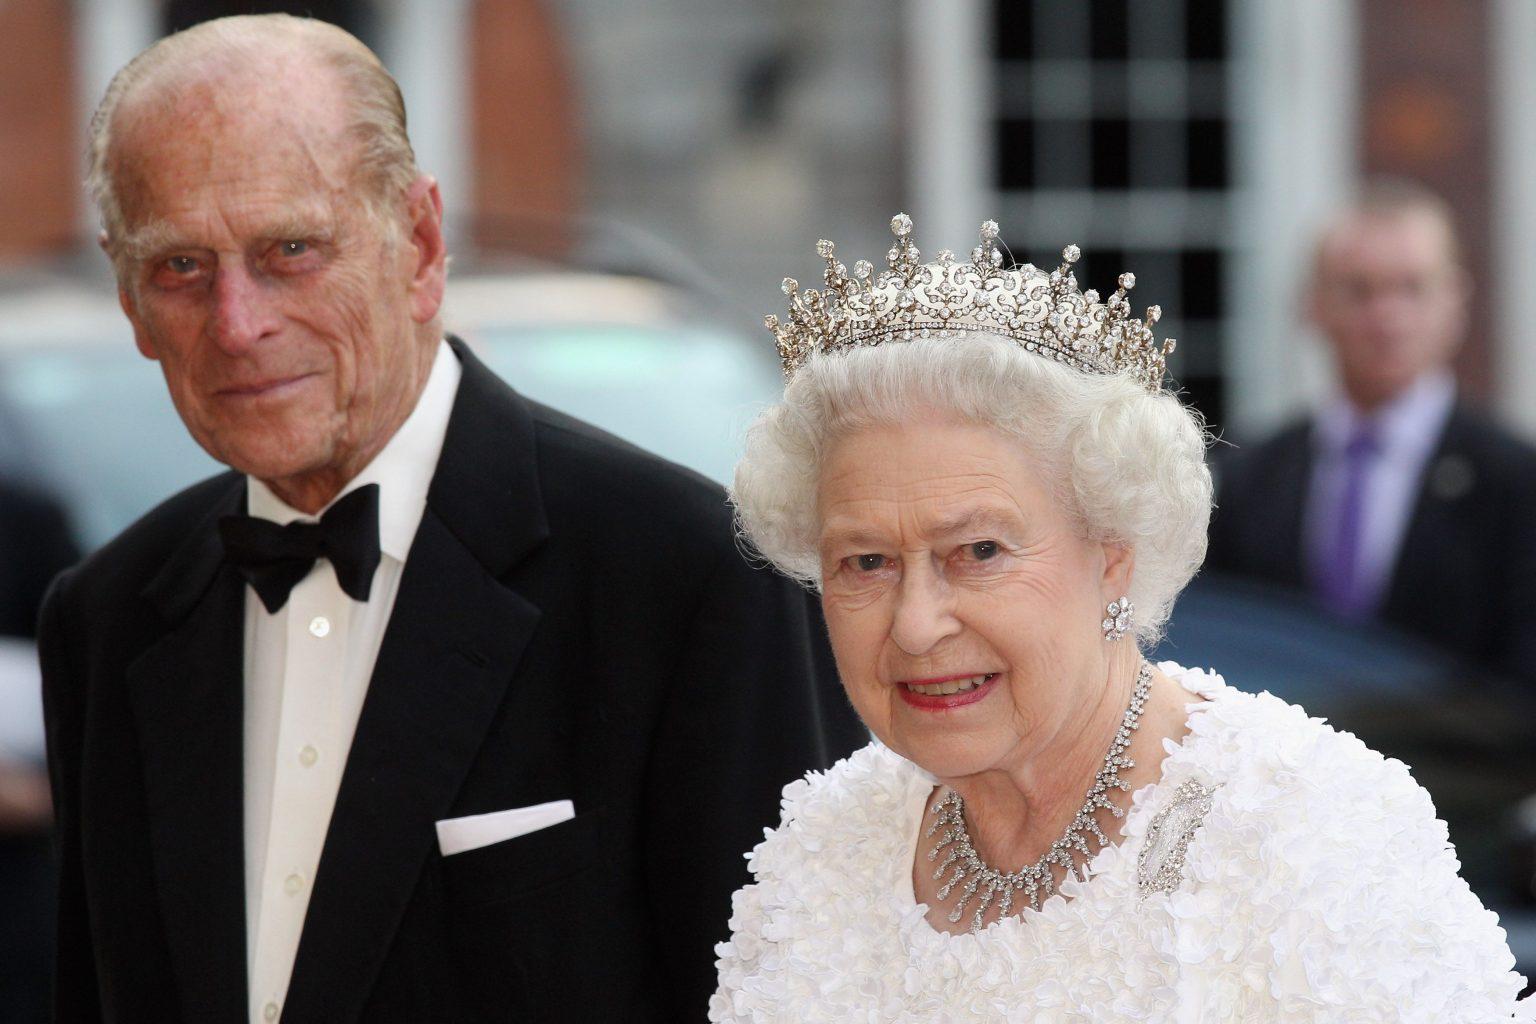 ملکه انگلیس واکسن کرونا دریافت کرد